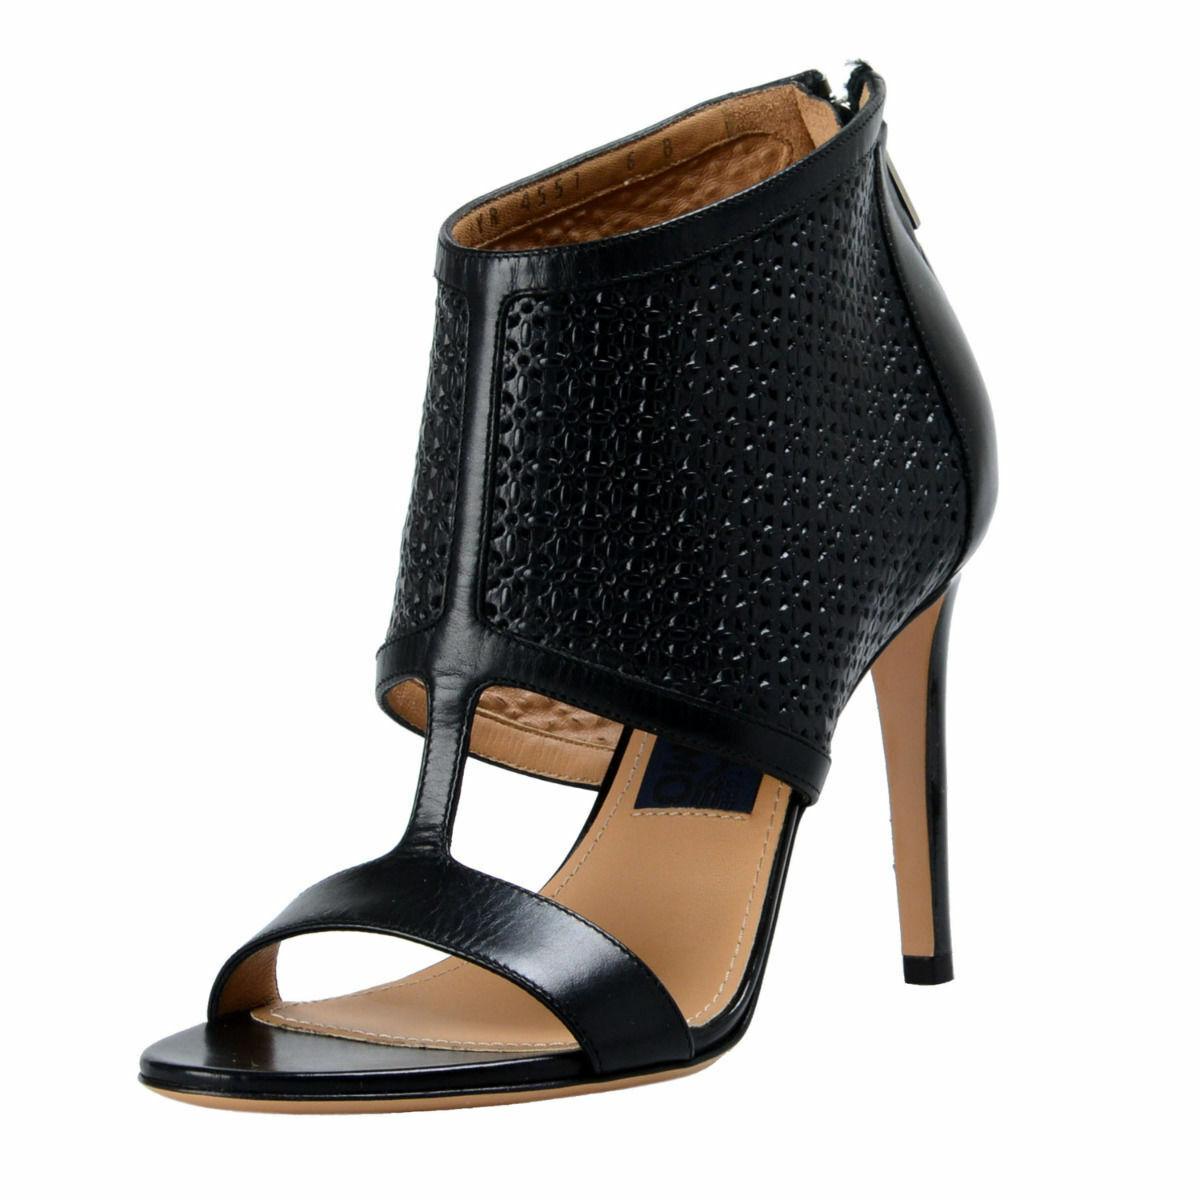 Salvatore Ferragamo  Pacella  Leather High Heel Pumps shoes 6 6.5 7 7.5 9.5 B C